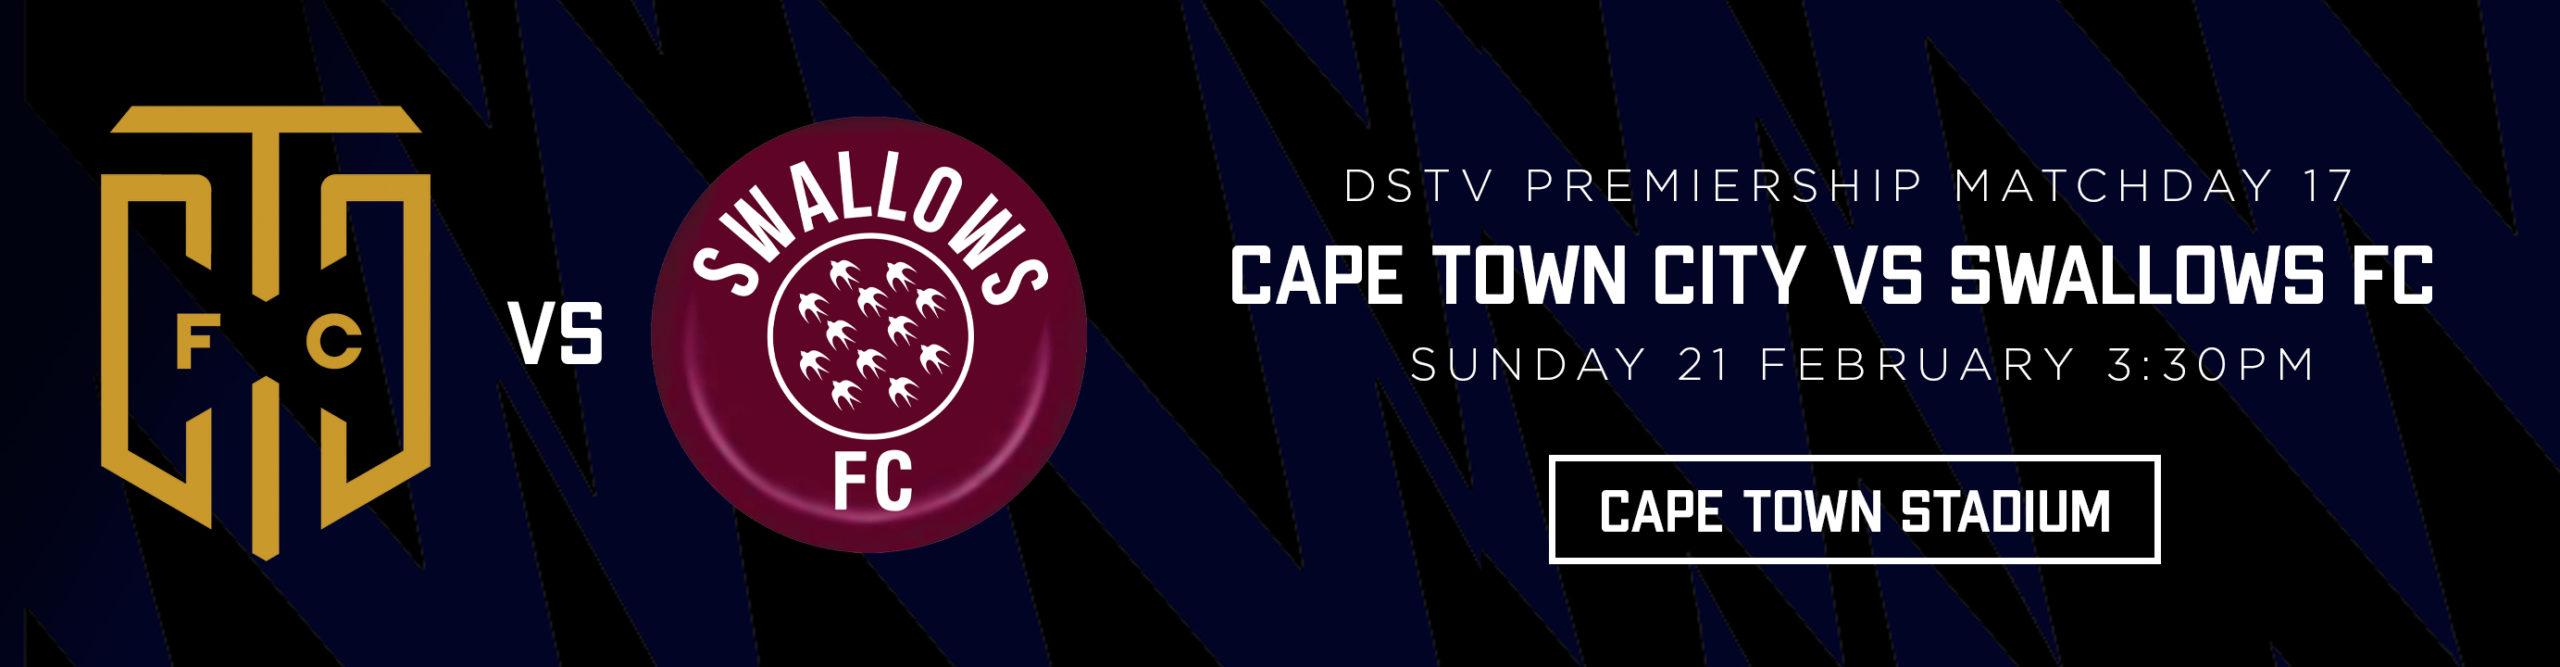 CAPE TOWN CITY VS SWALLOWS FC